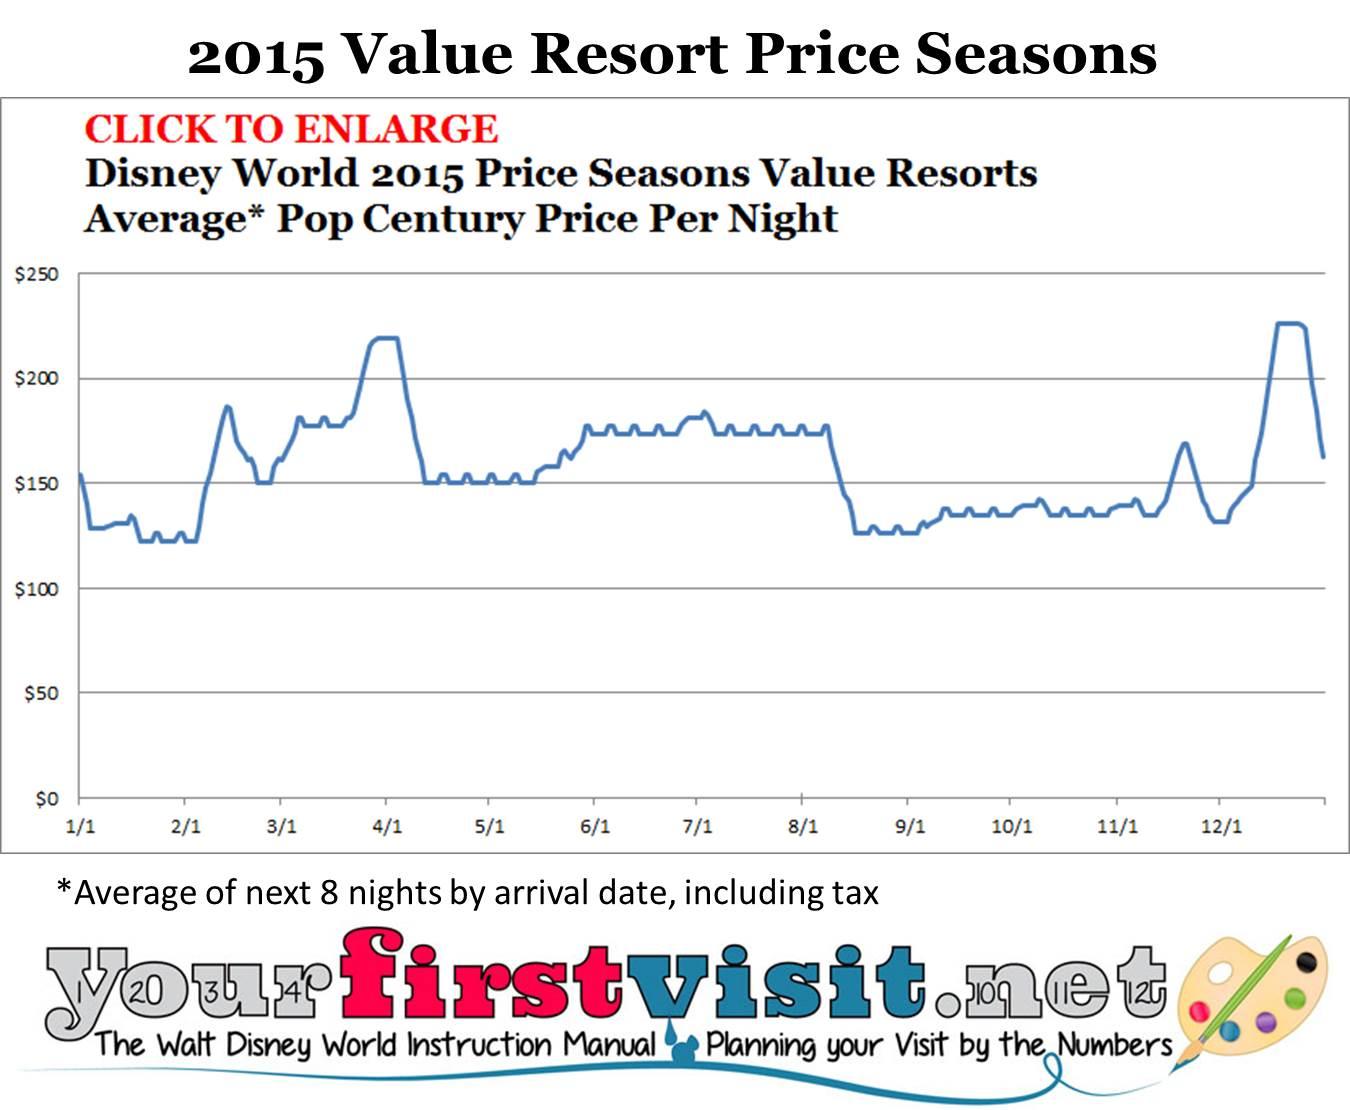 Disney World 2015 Value Resort Price Seasons from yourfirstvisit.net